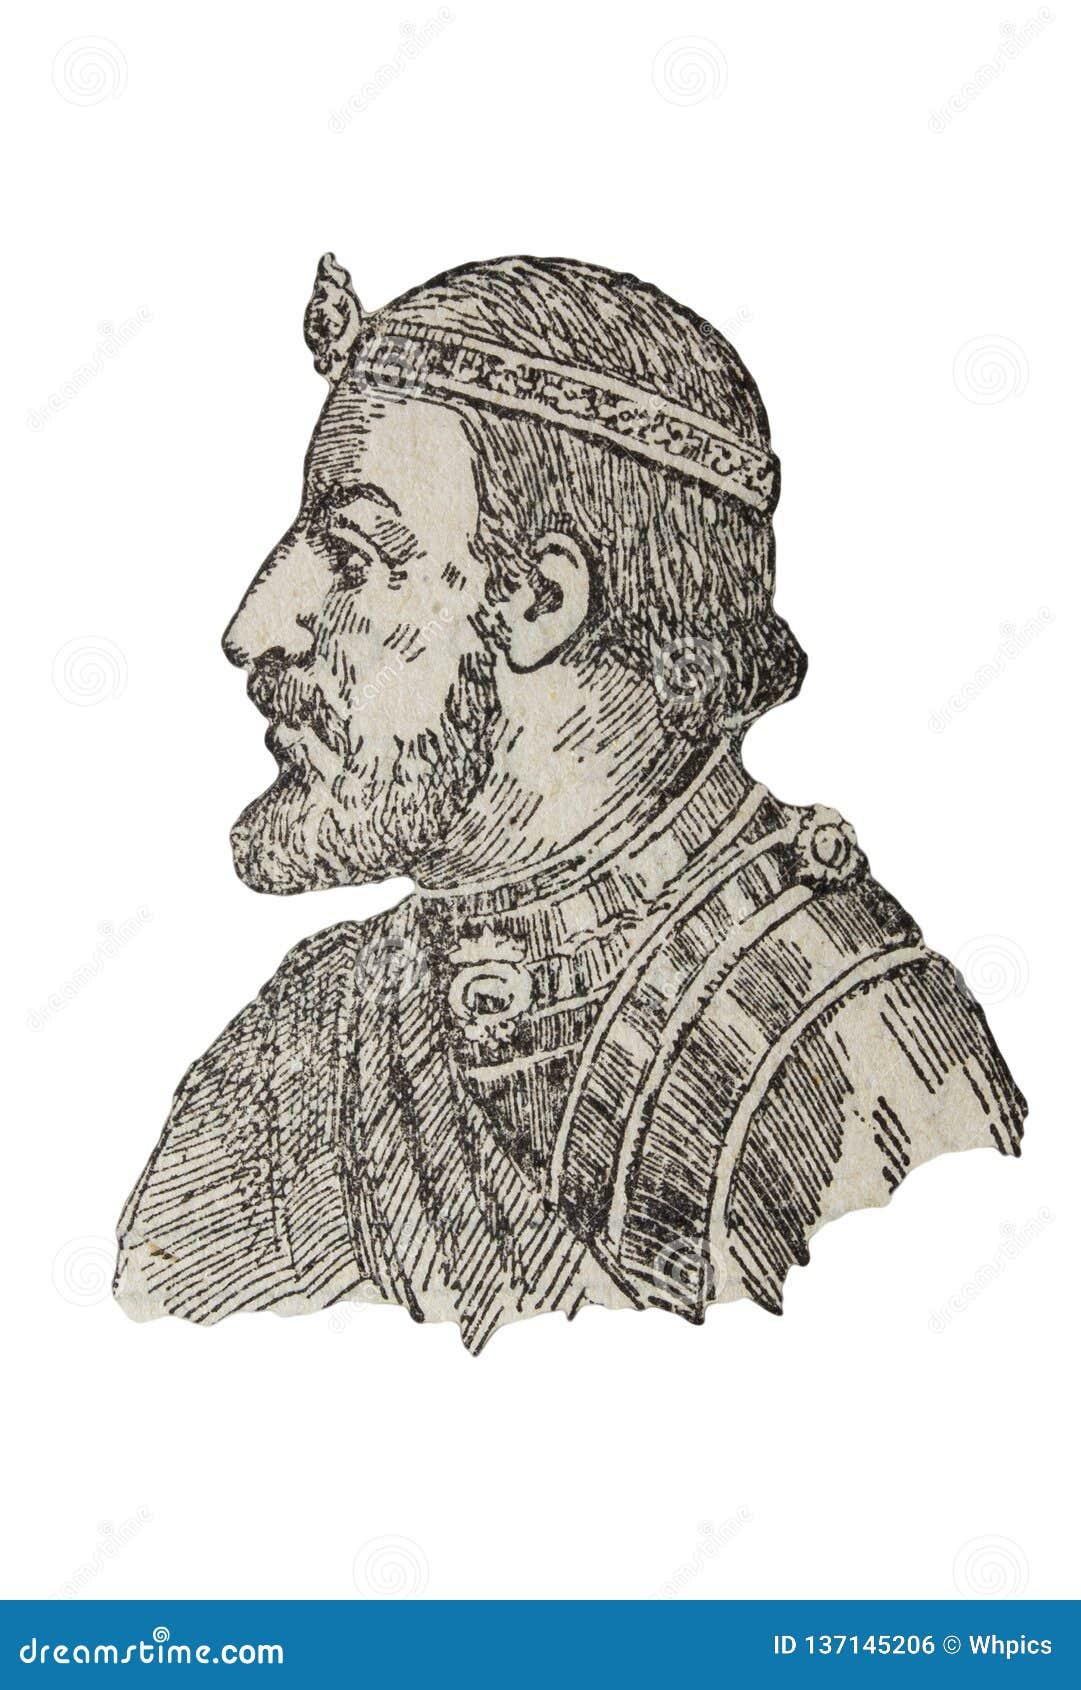 Ramon Berenguer III, cuenta de Barcelona, Girona, y Ausona a partir de 1086 a 1131